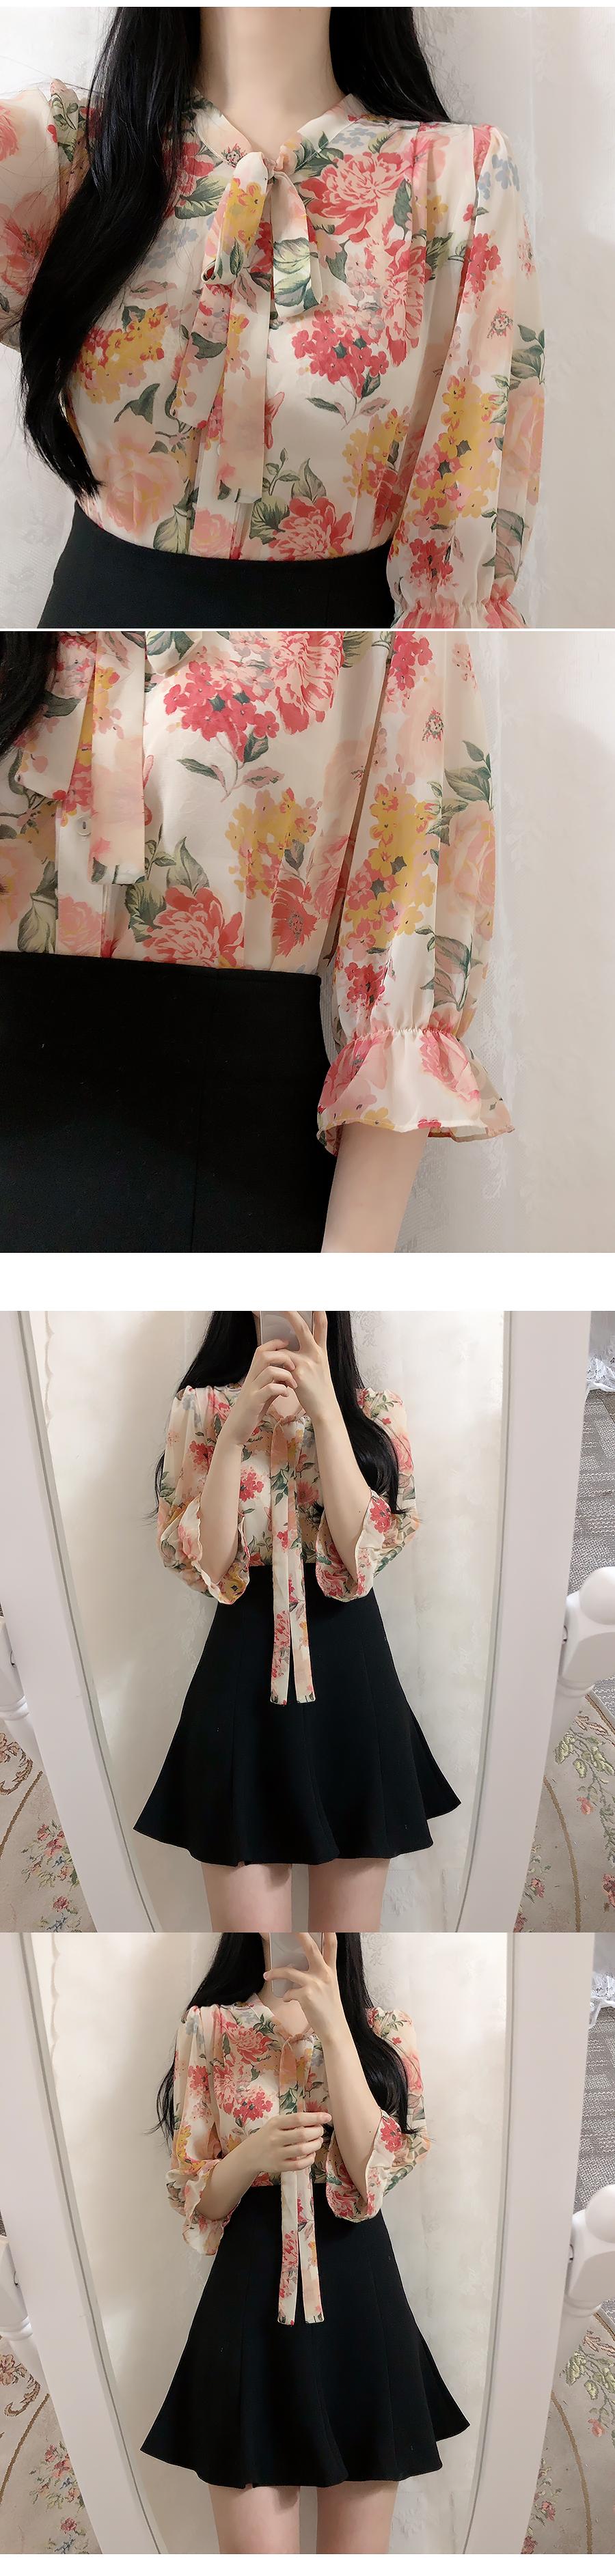 Hershey Flower Ribbon blouse